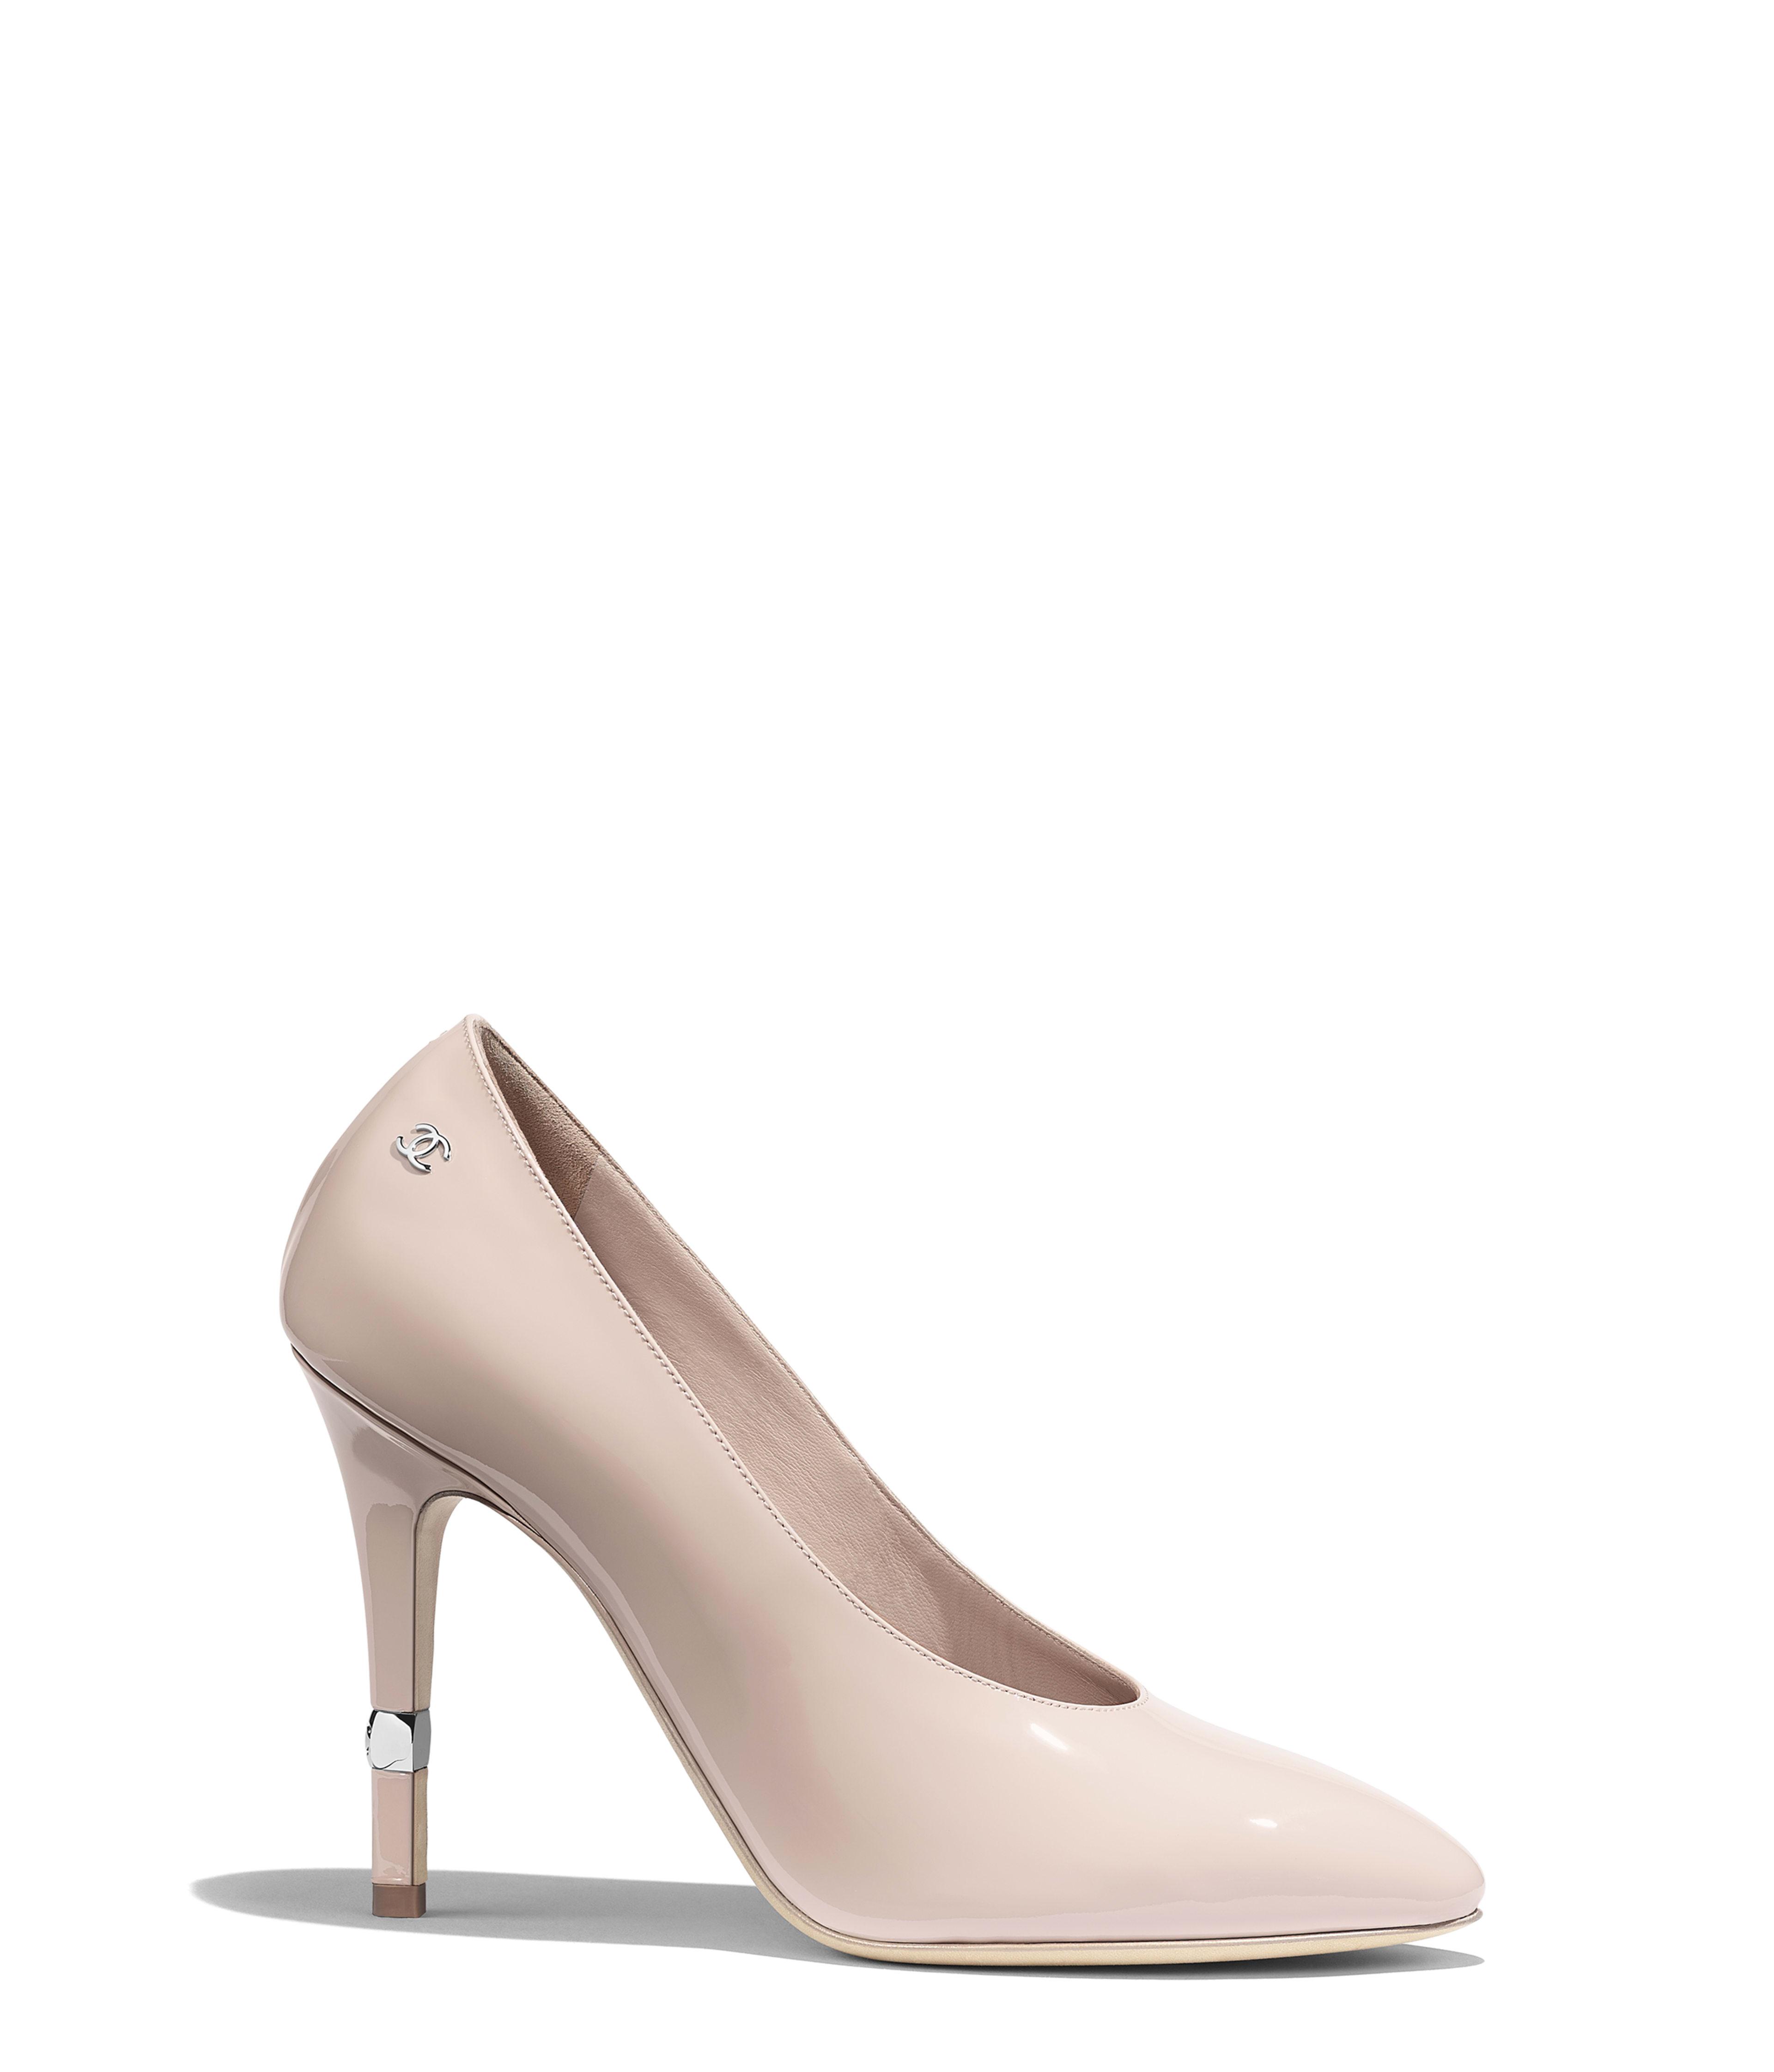 58c912b3c24c Pumps   Slingbacks - Shoes